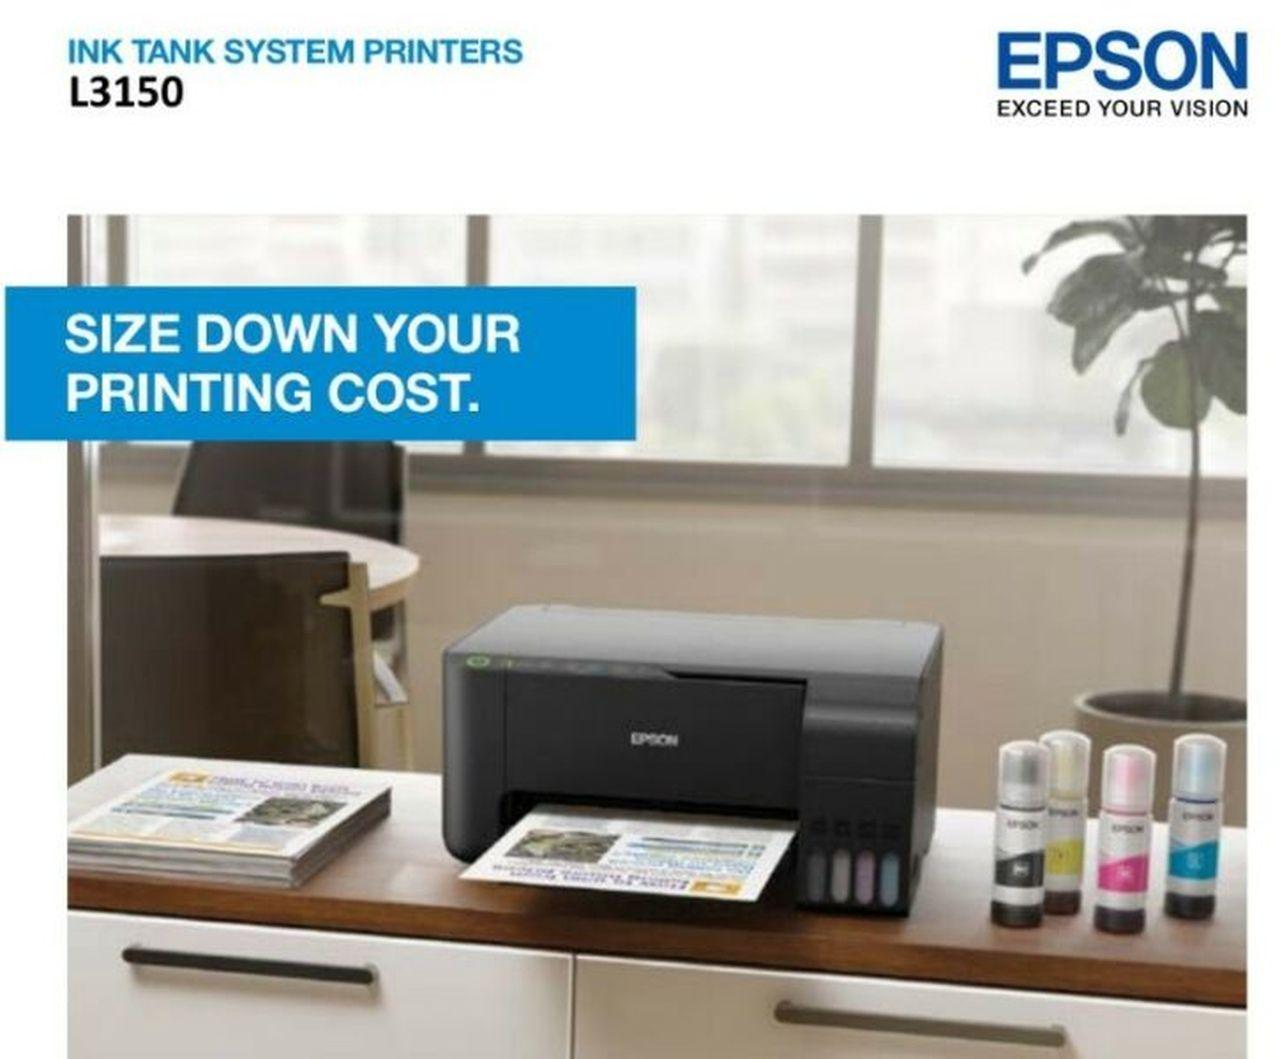 Impressora Multifuncional Epson L3150